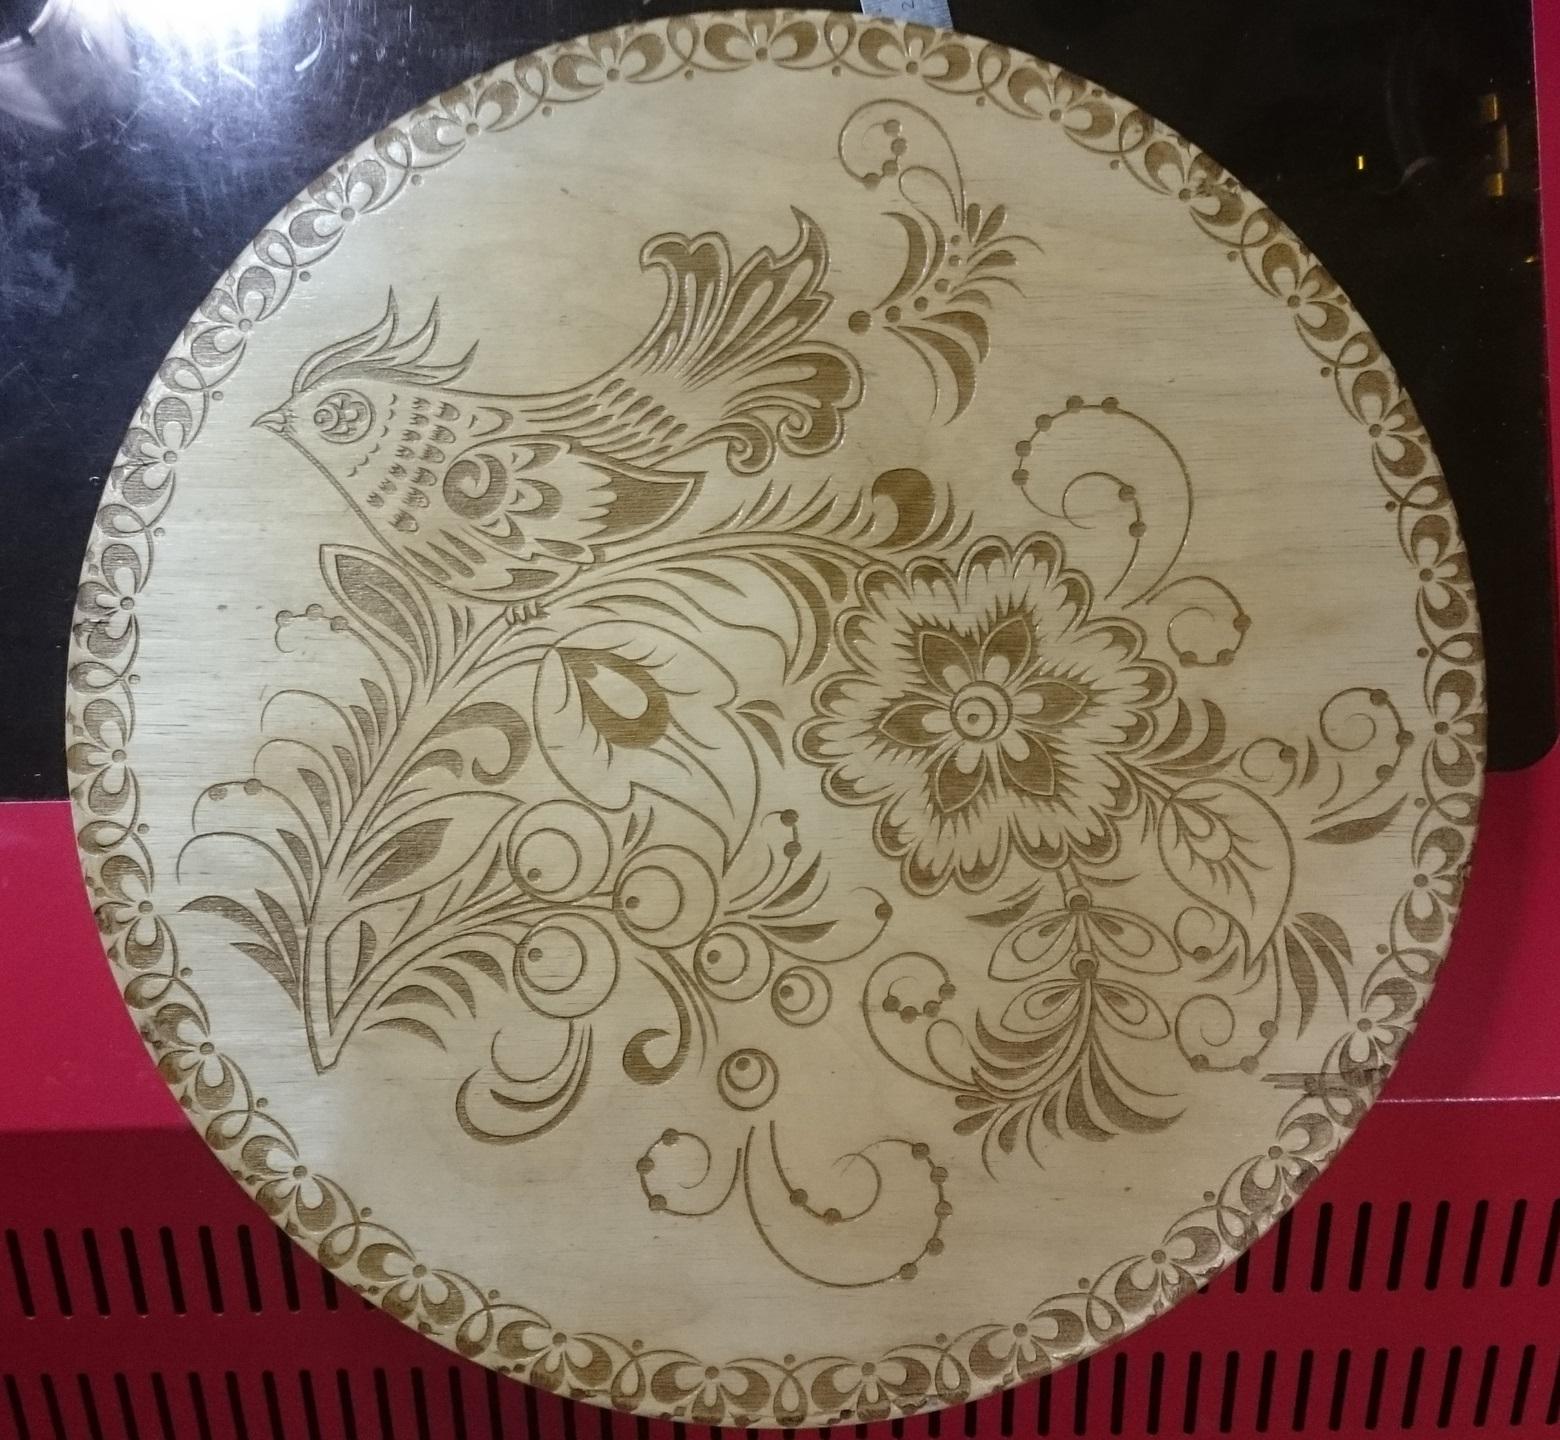 Laser Engraving Decorative Design Free Vector